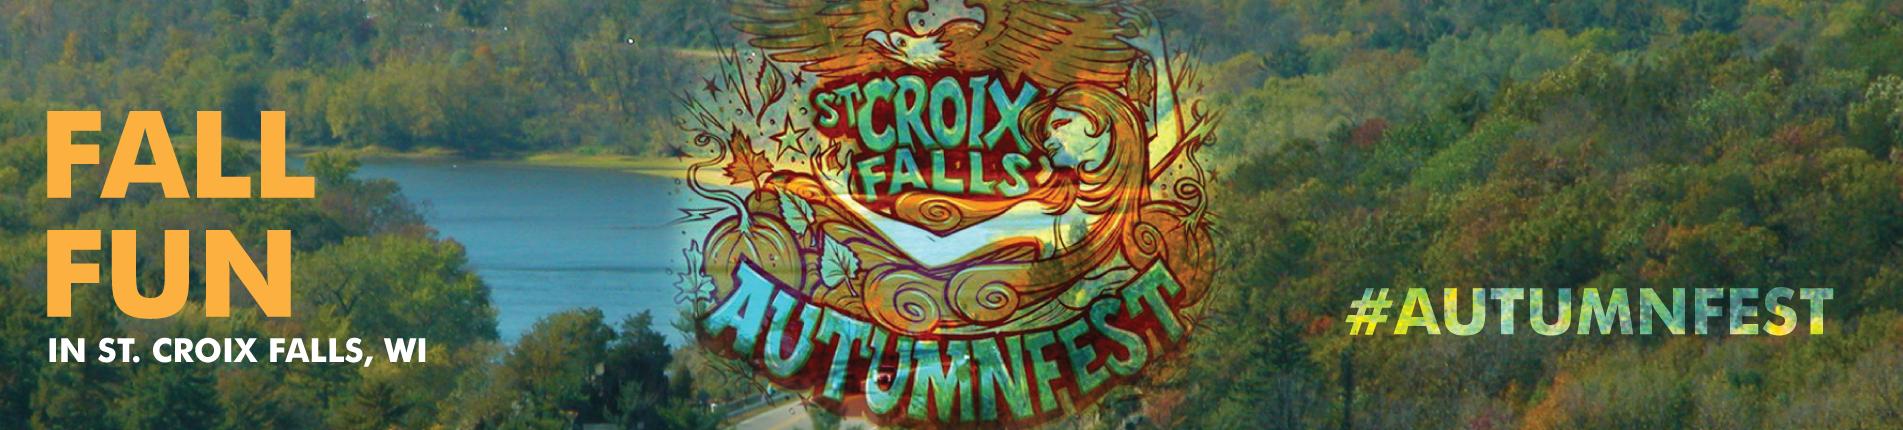 Fall Fun at AutumnFest